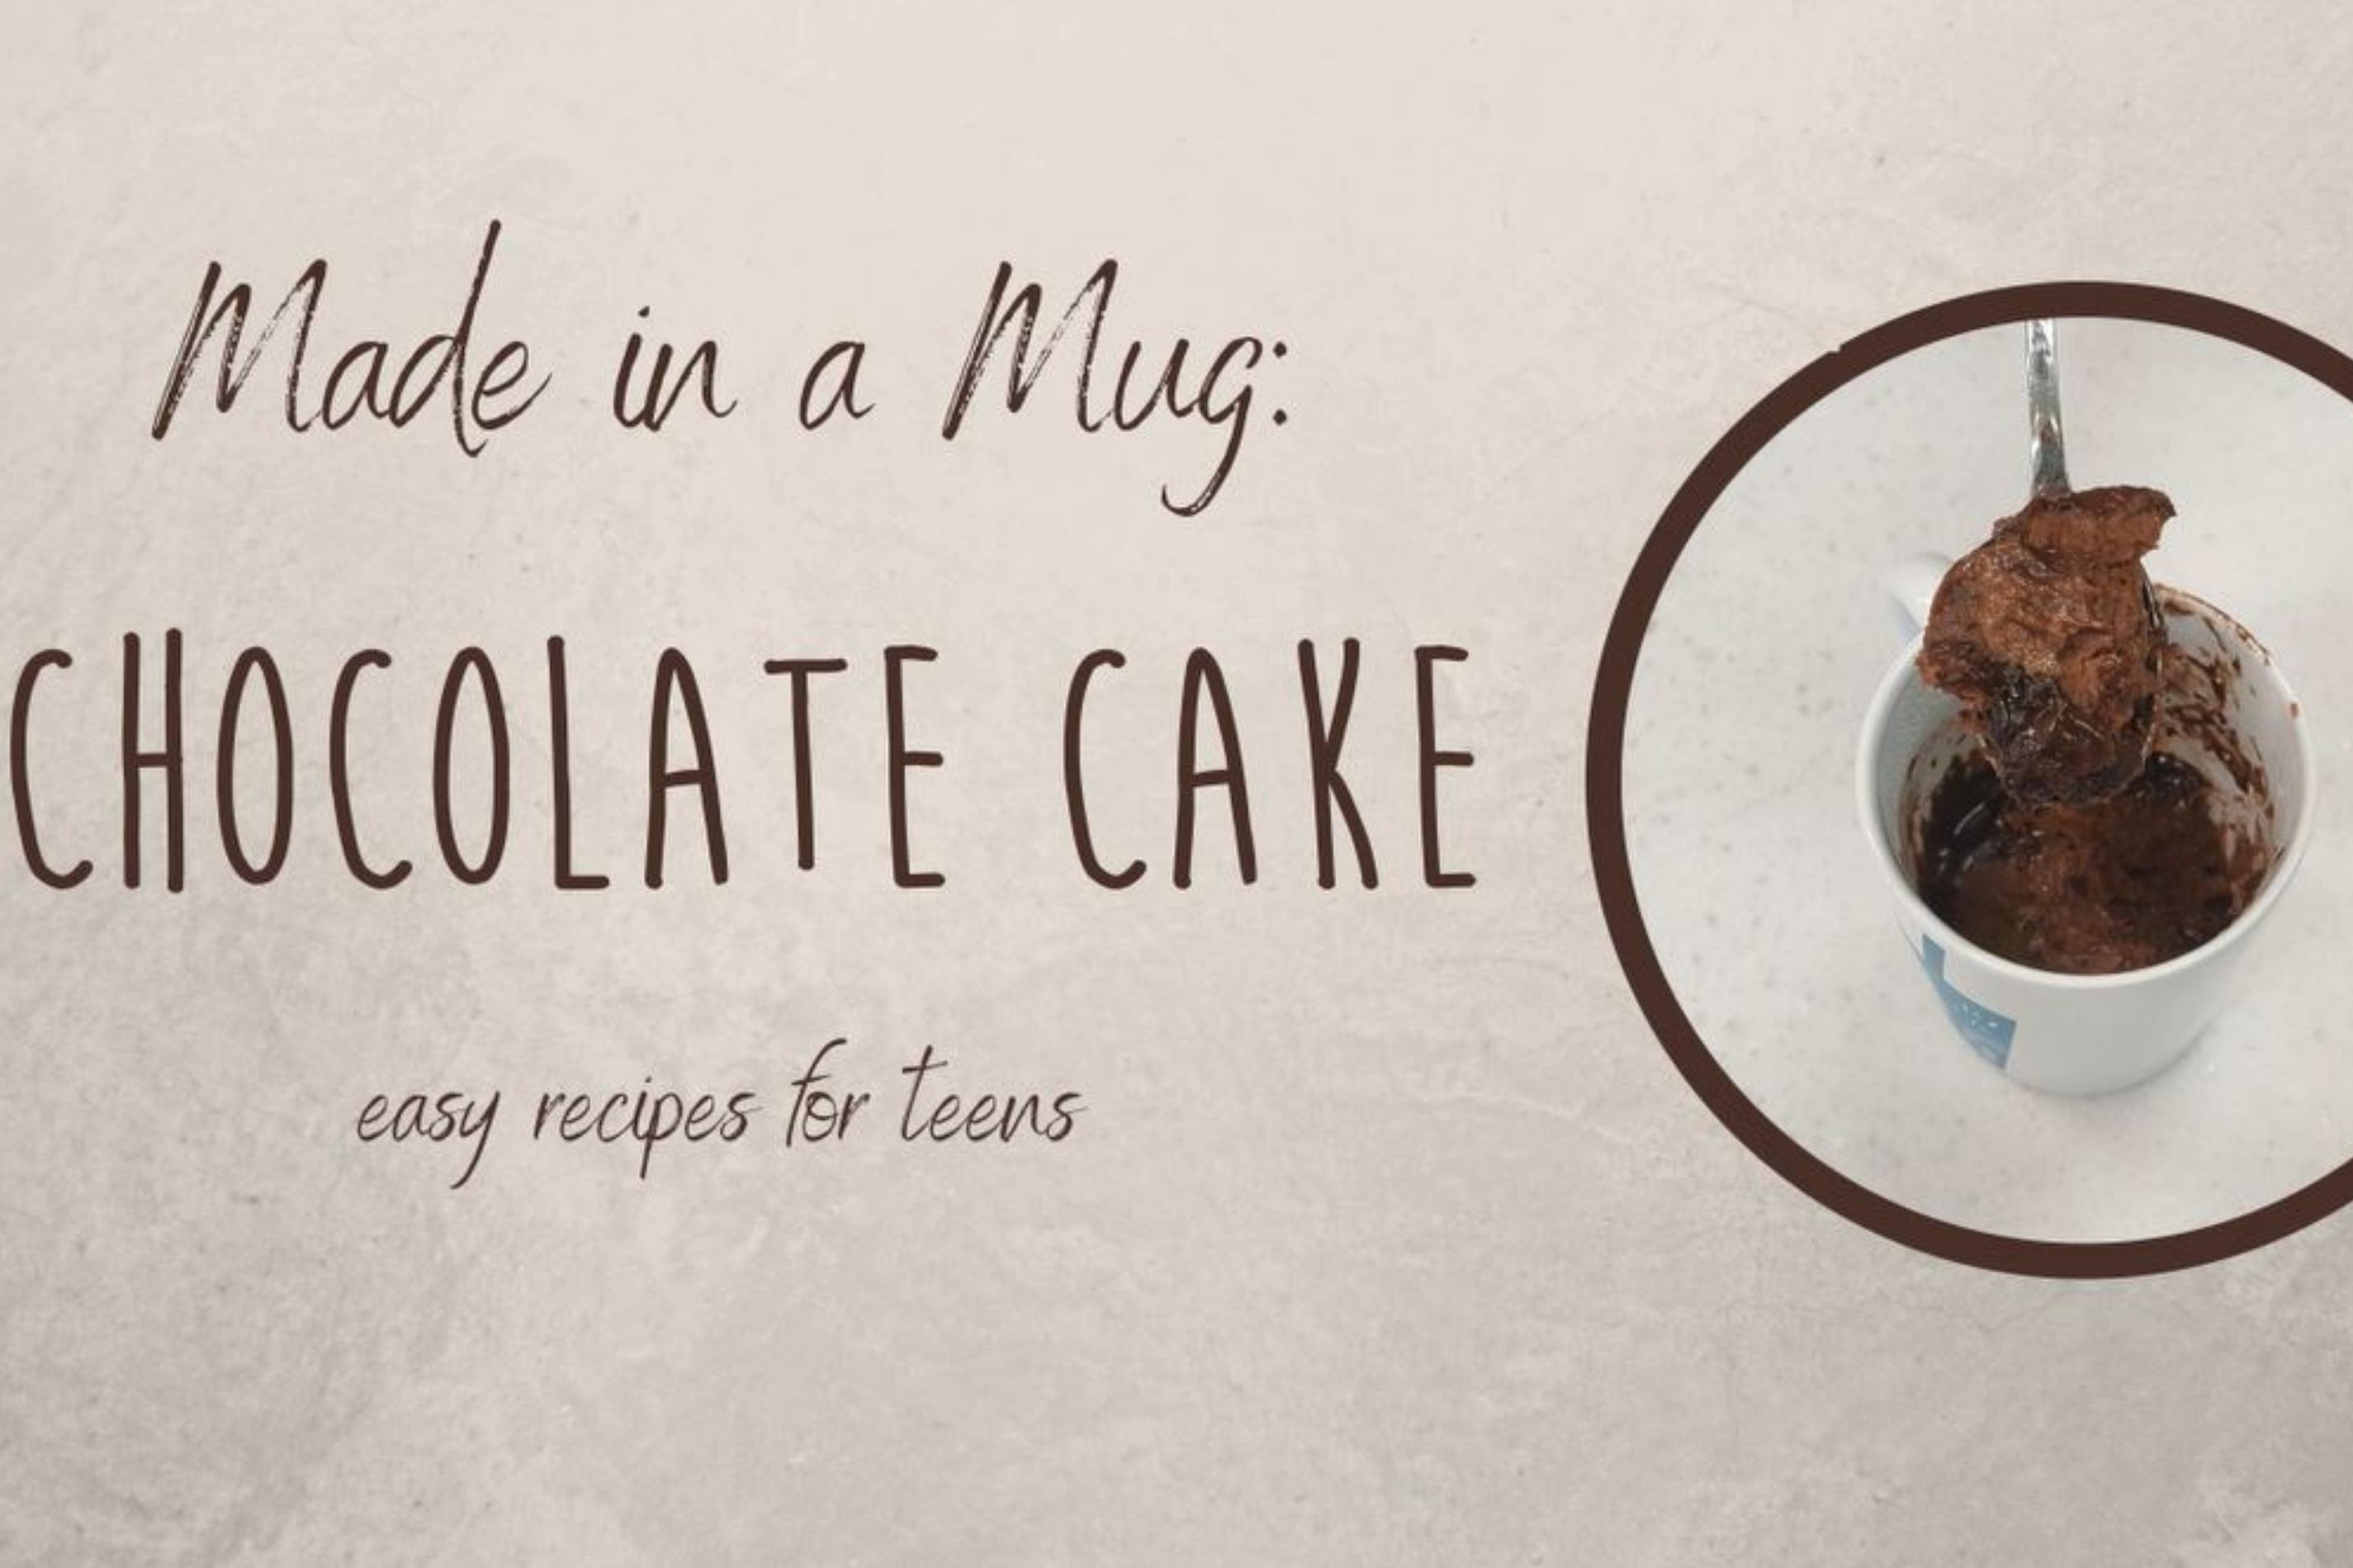 Made in a Mug: Chocolate Cake